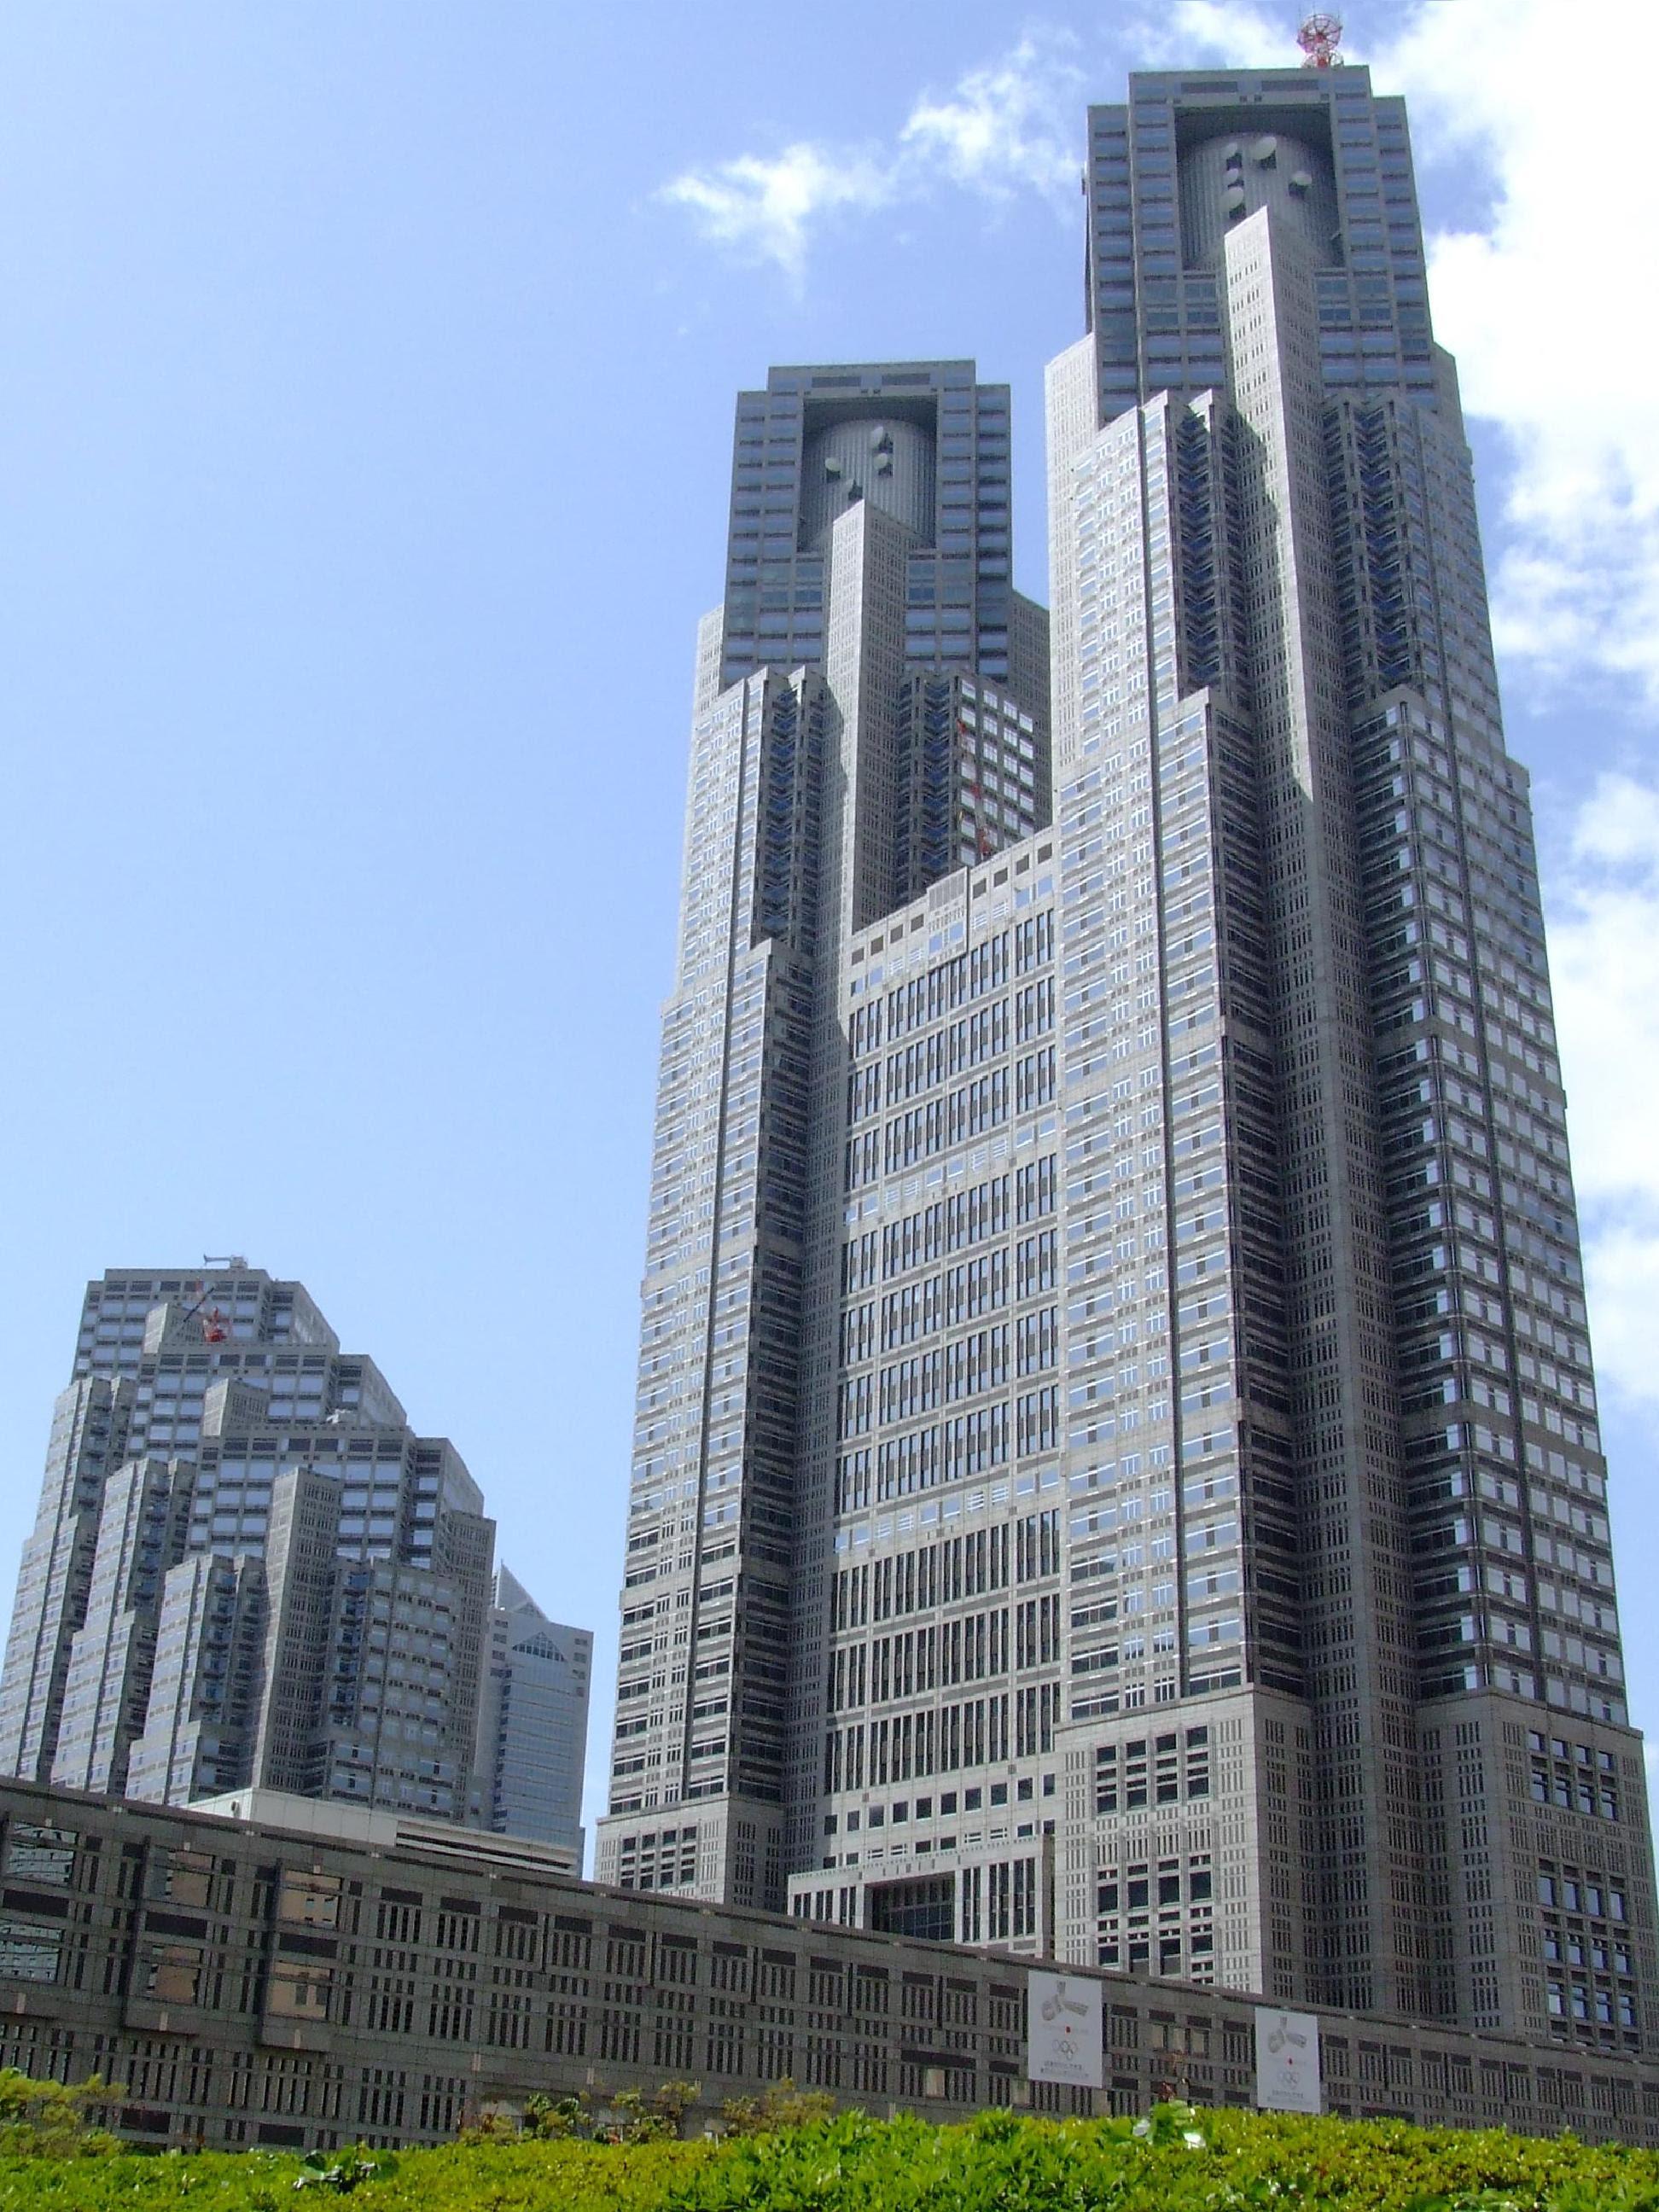 http://upload.wikimedia.org/wikipedia/commons/b/b8/Tokyo_Metropolitan_Government_Building_Oka1.JPG